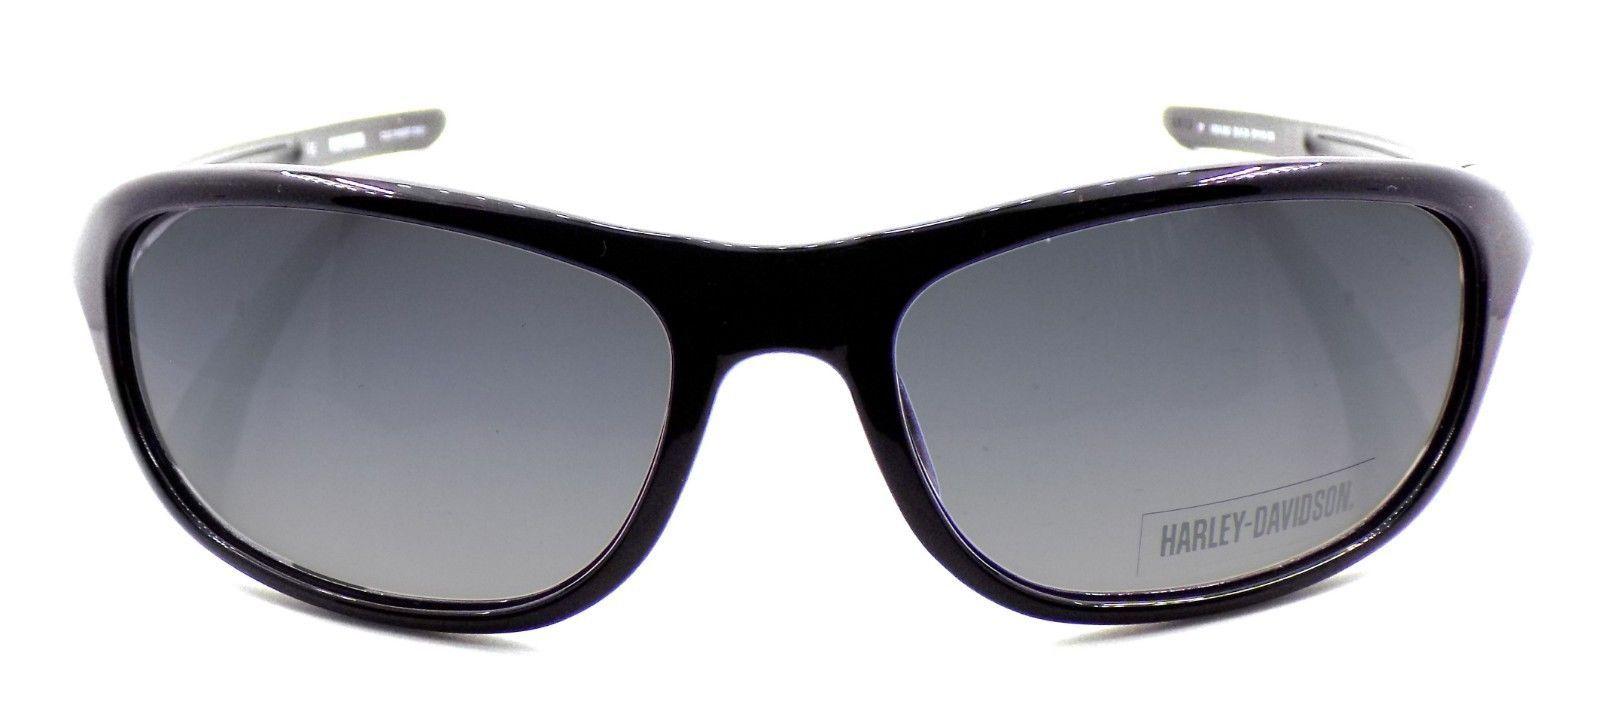 Harley Davidson HDX862 BLK Wraparound Sunglasses Black 67-19-135 Smoke Gradient